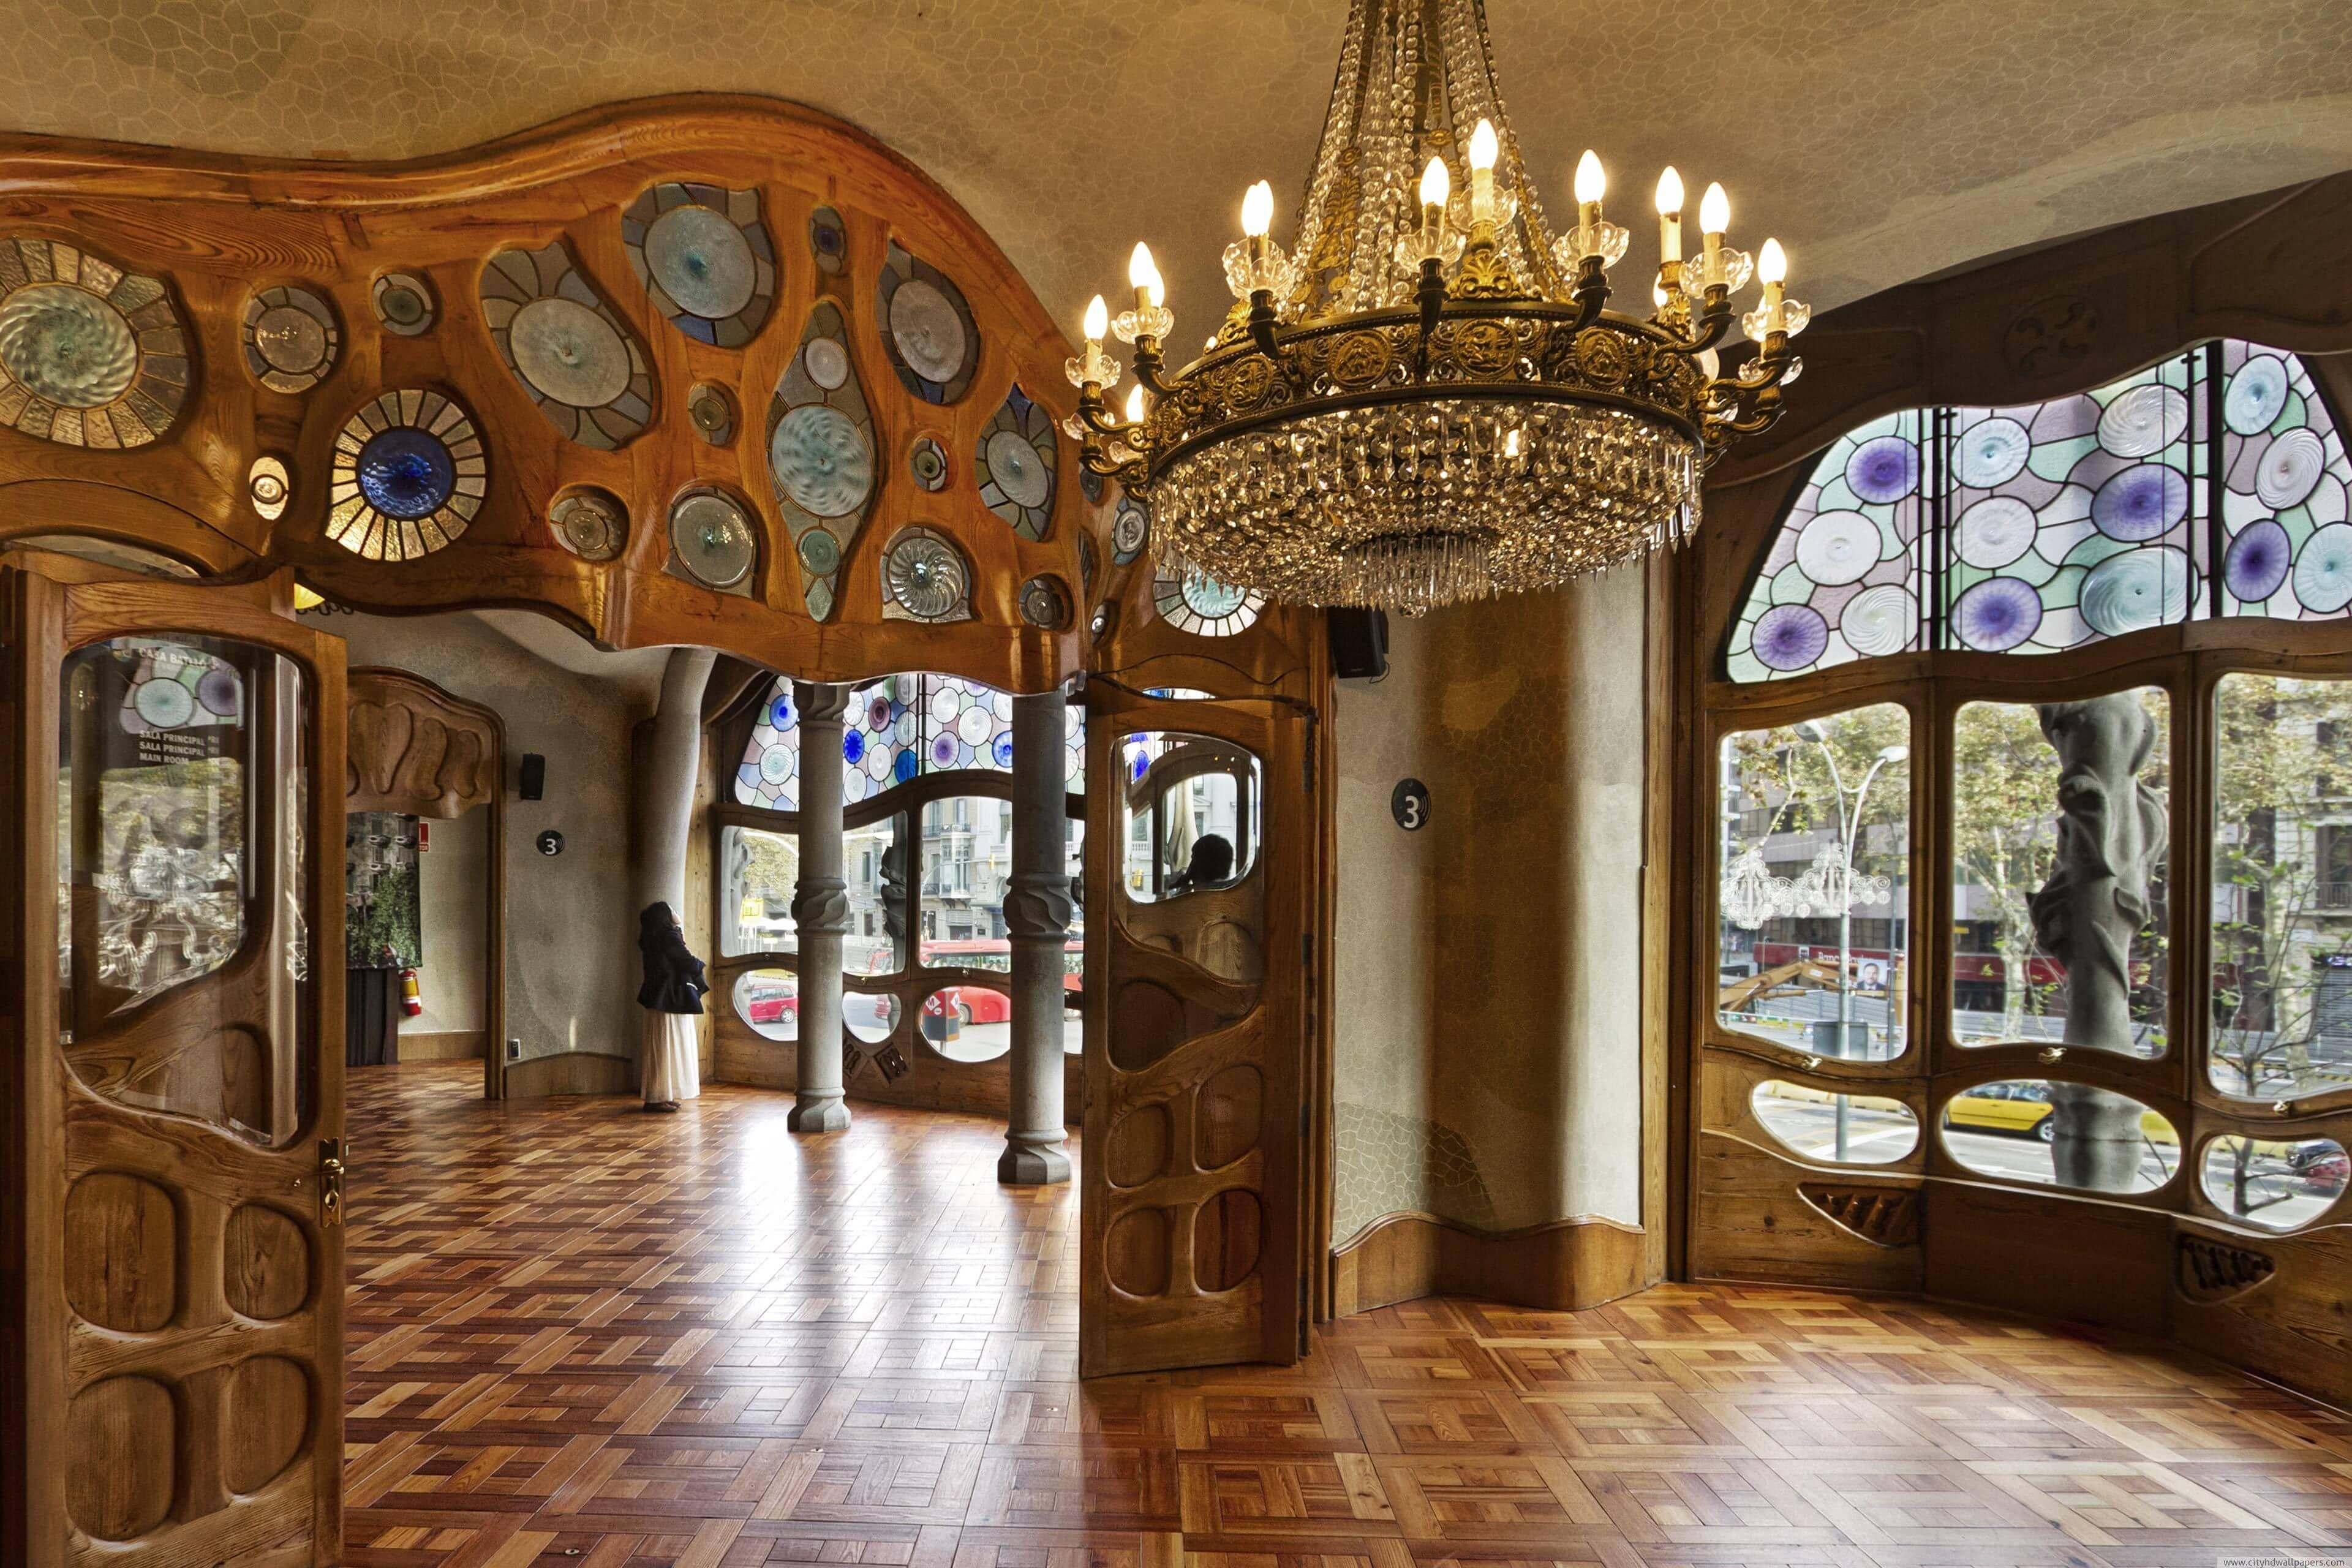 casa-batllo-building-internal-in-barcelona-city